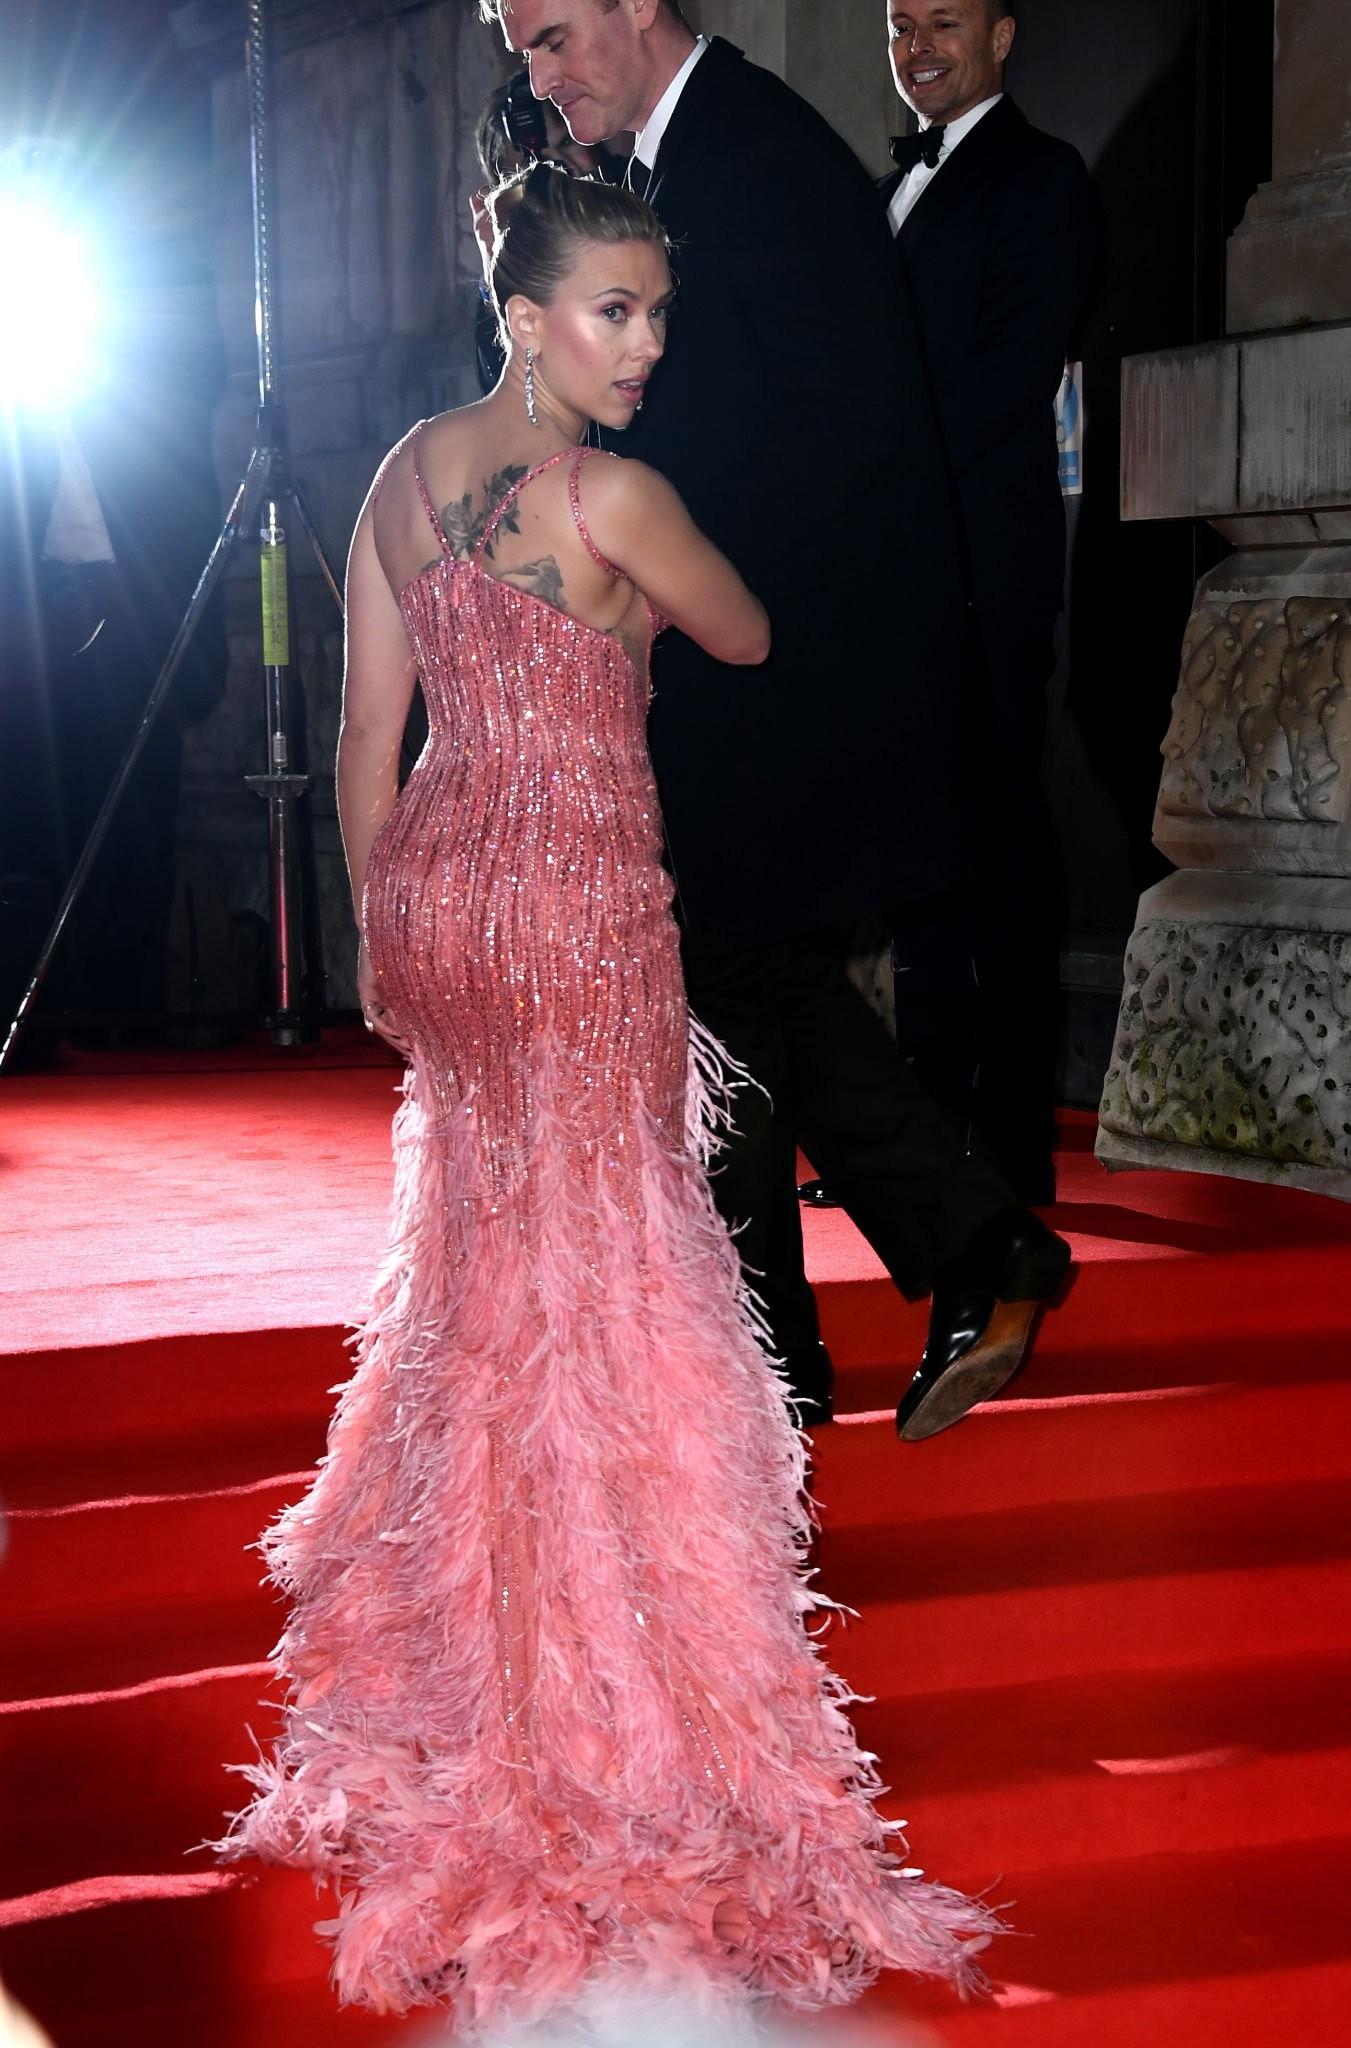 Scarlett Johansson Sexy Boobs - Hot Celebs Home